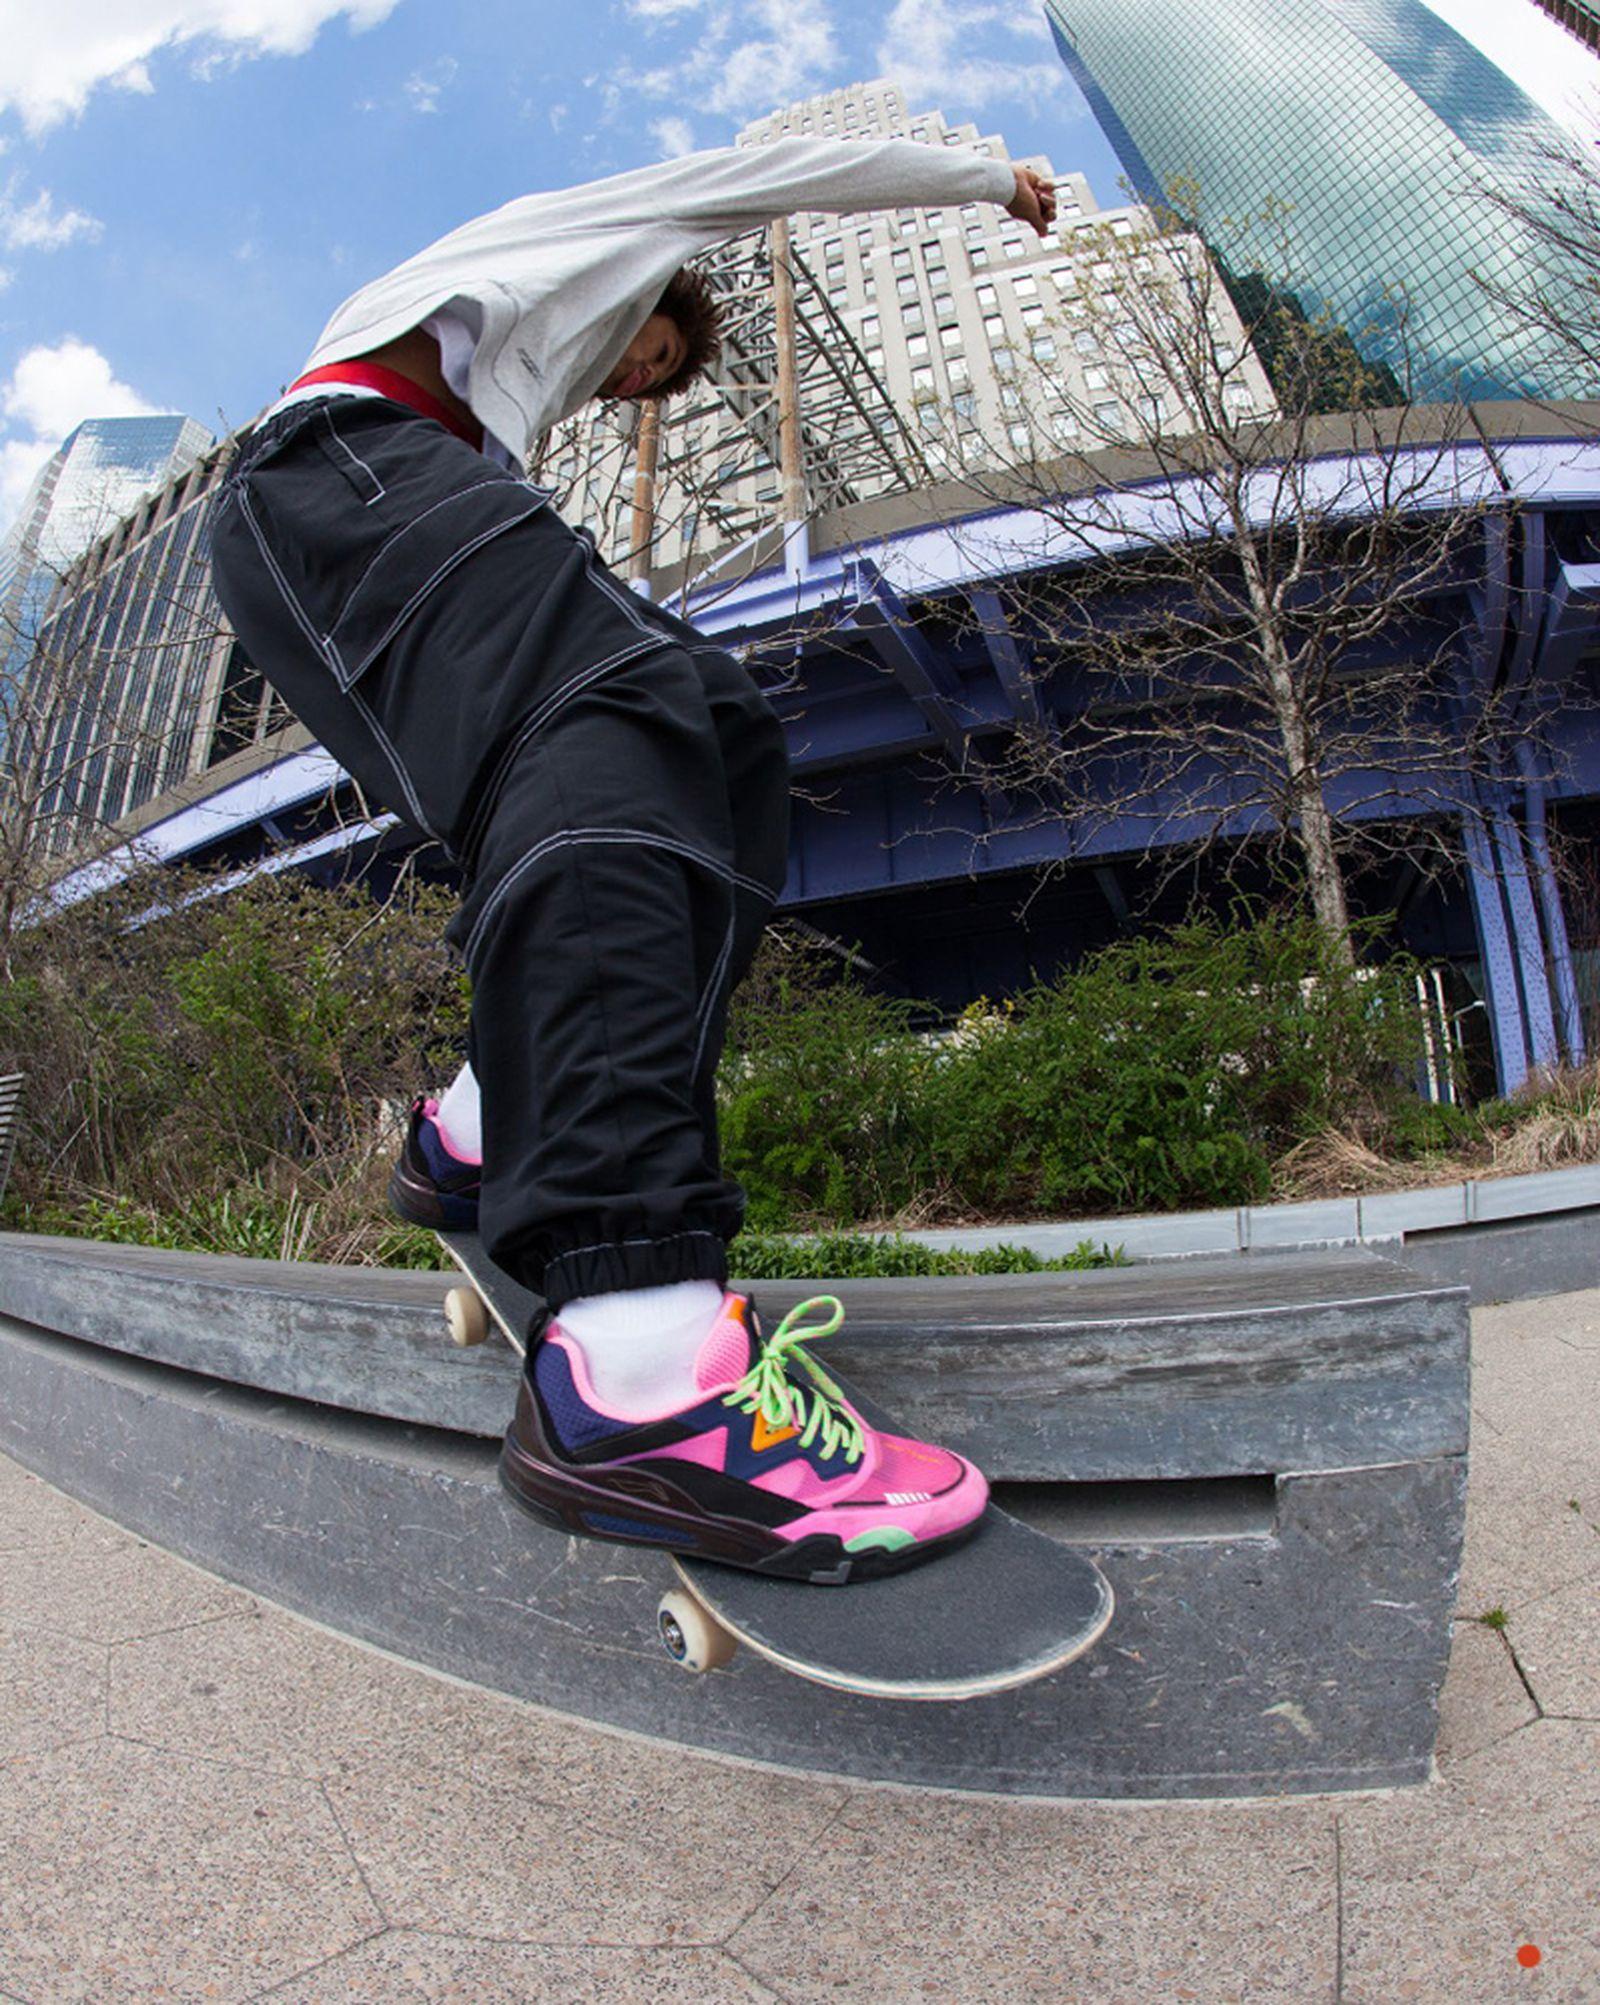 li-ning-skate-collection-erik-ellington-release-date-price-06